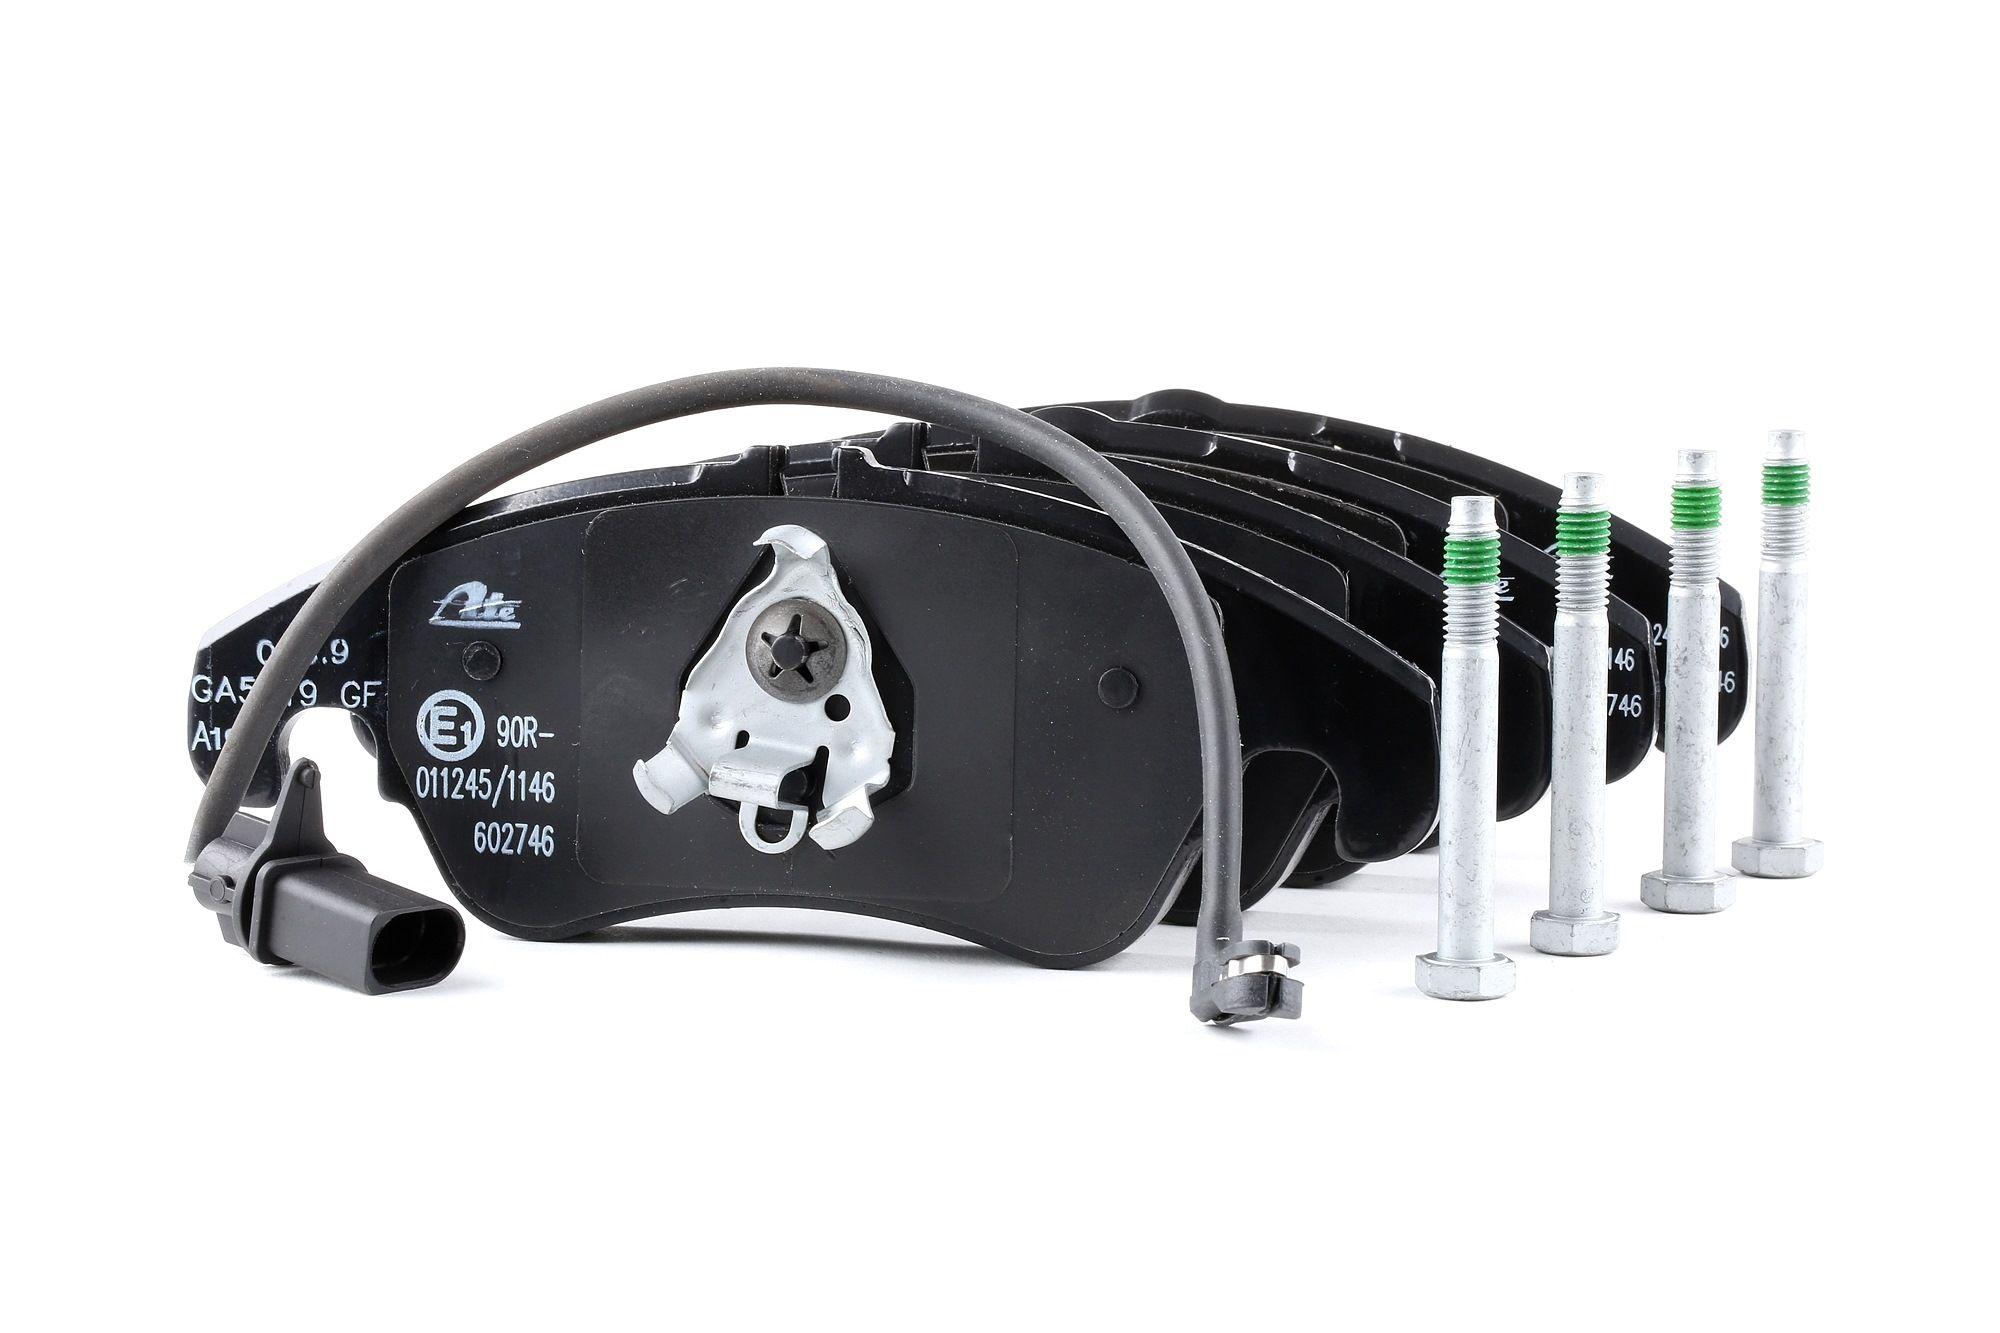 AUDI A4 2014 Bremsbelagsatz - Original ATE 13.0460-2746.2 Höhe 2: 73,0mm, Höhe: 73,5mm, Breite: 188,0mm, Dicke/Stärke: 19,2mm